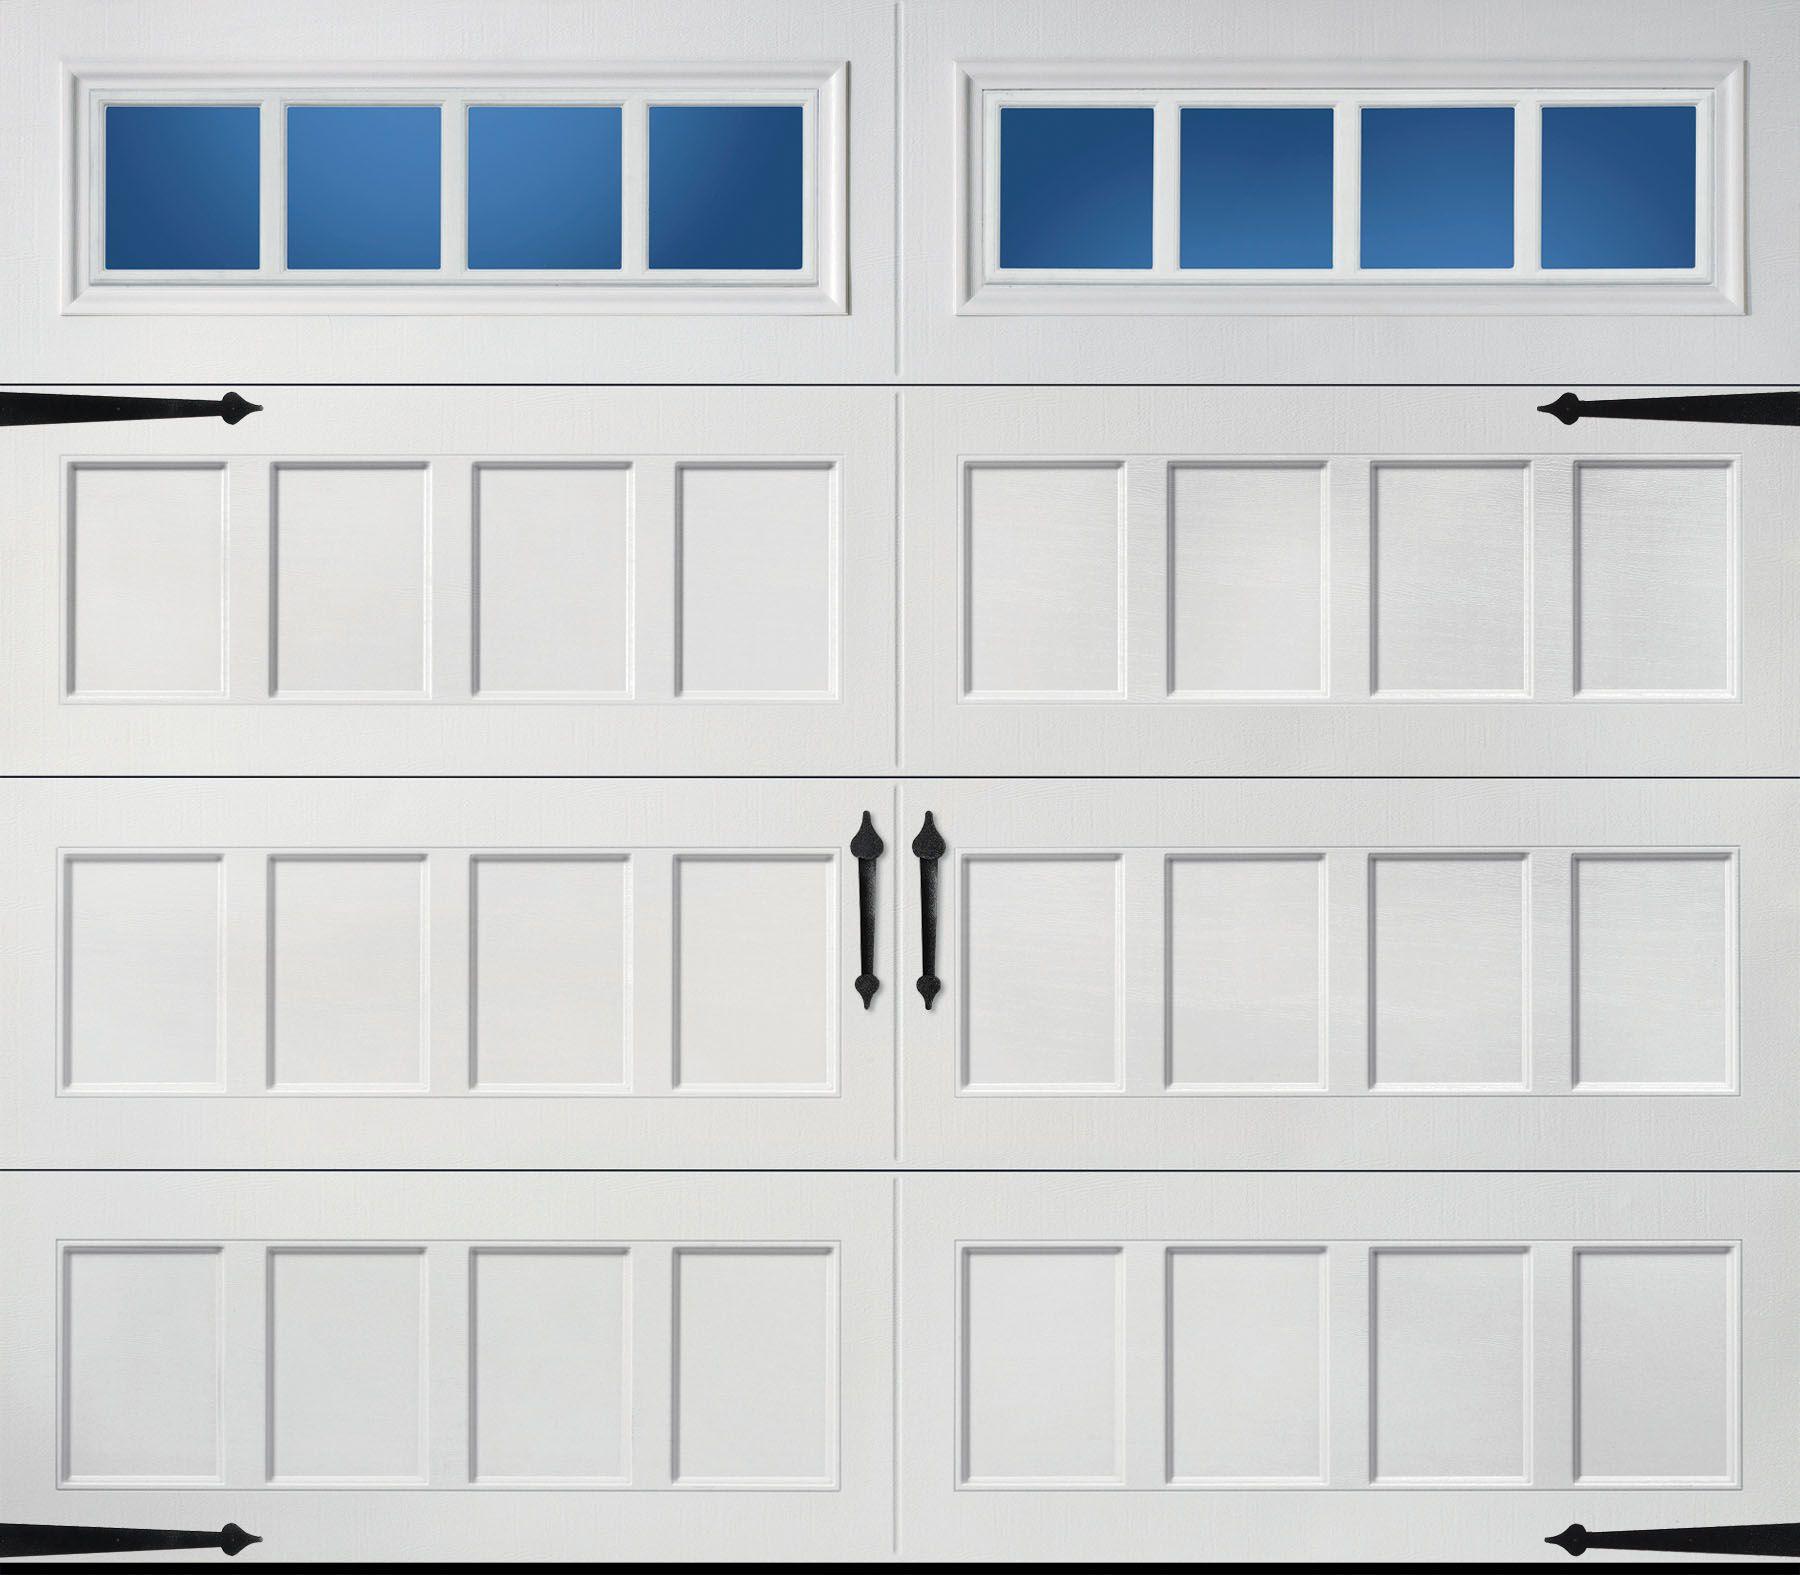 Recessed long panel thames windows showroom pinterest pella carriage house series x insulated sandtone single garage door eventelaan Gallery